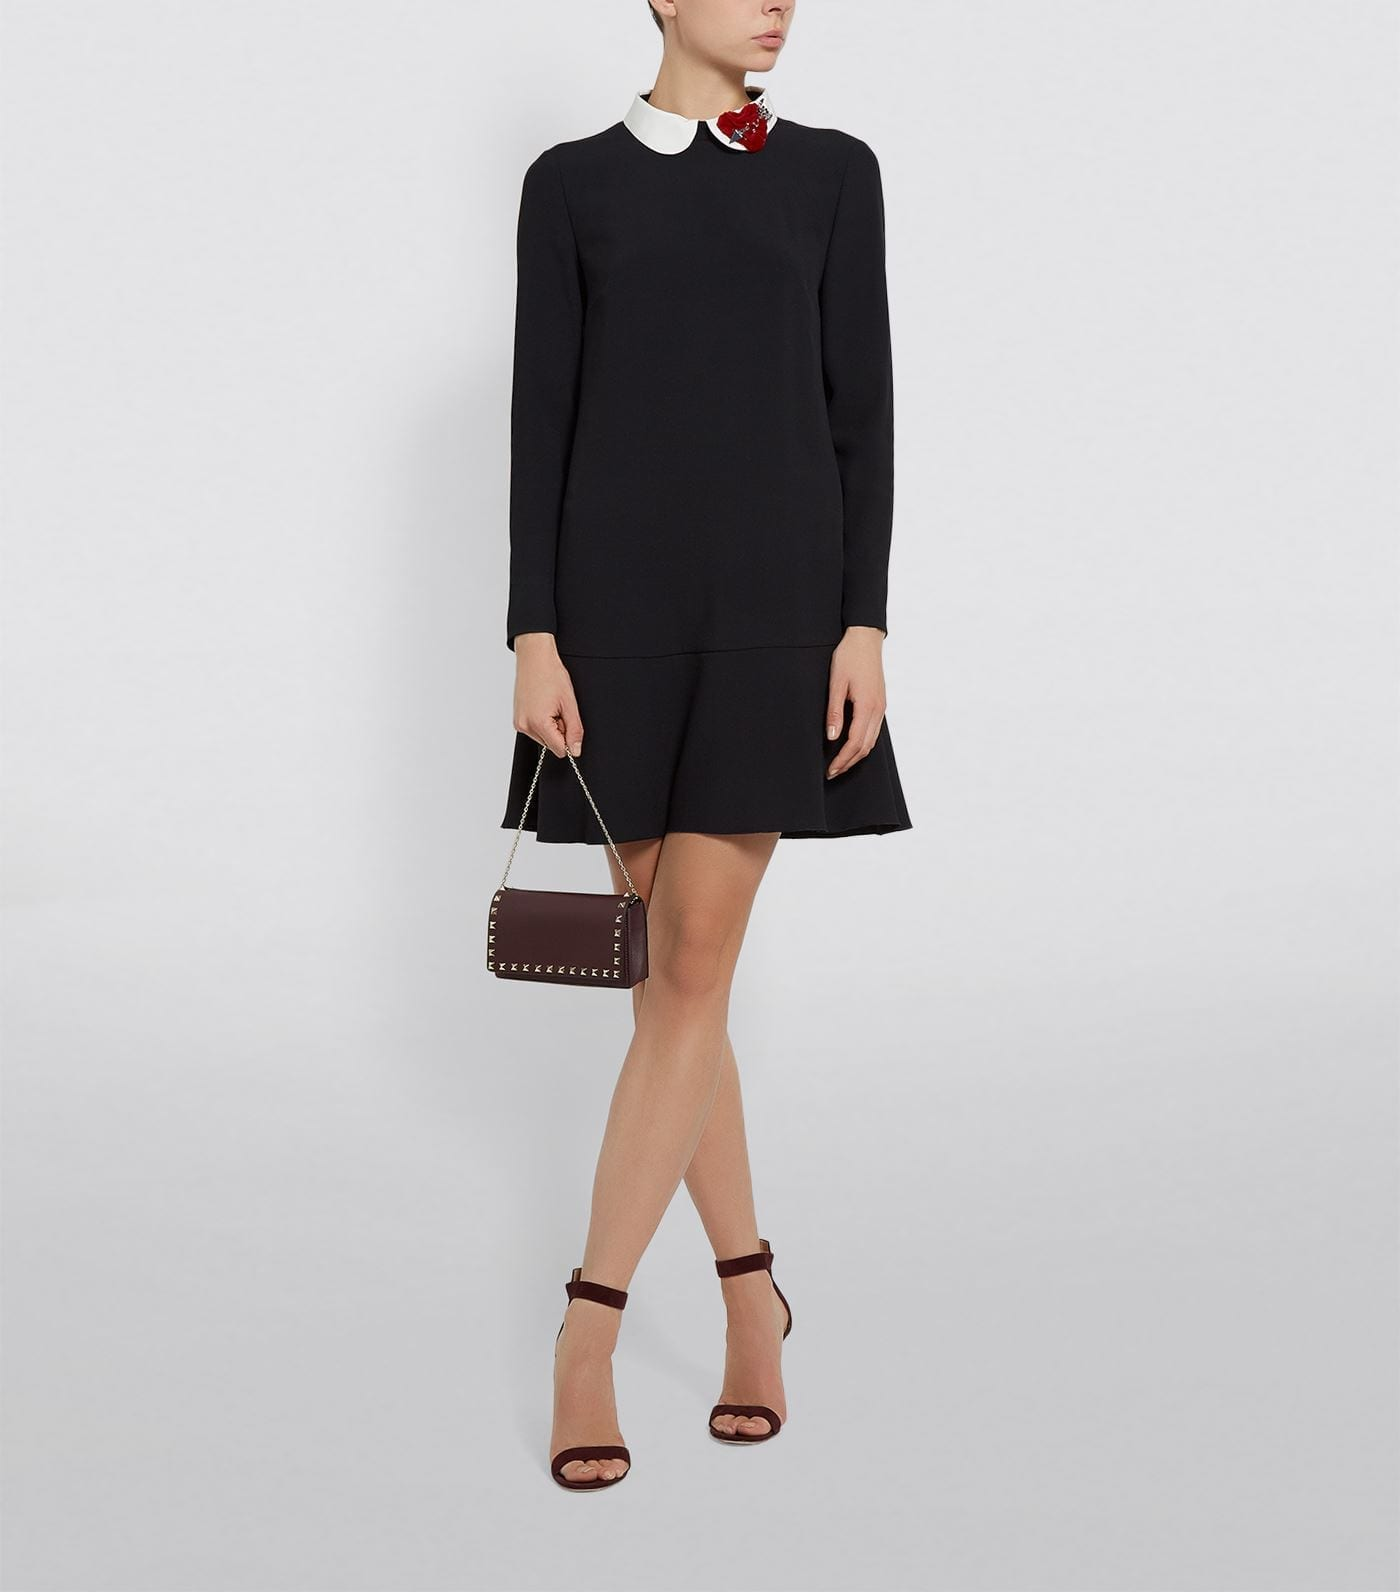 RED VALENTINO Crepe Embellished Collar Dress